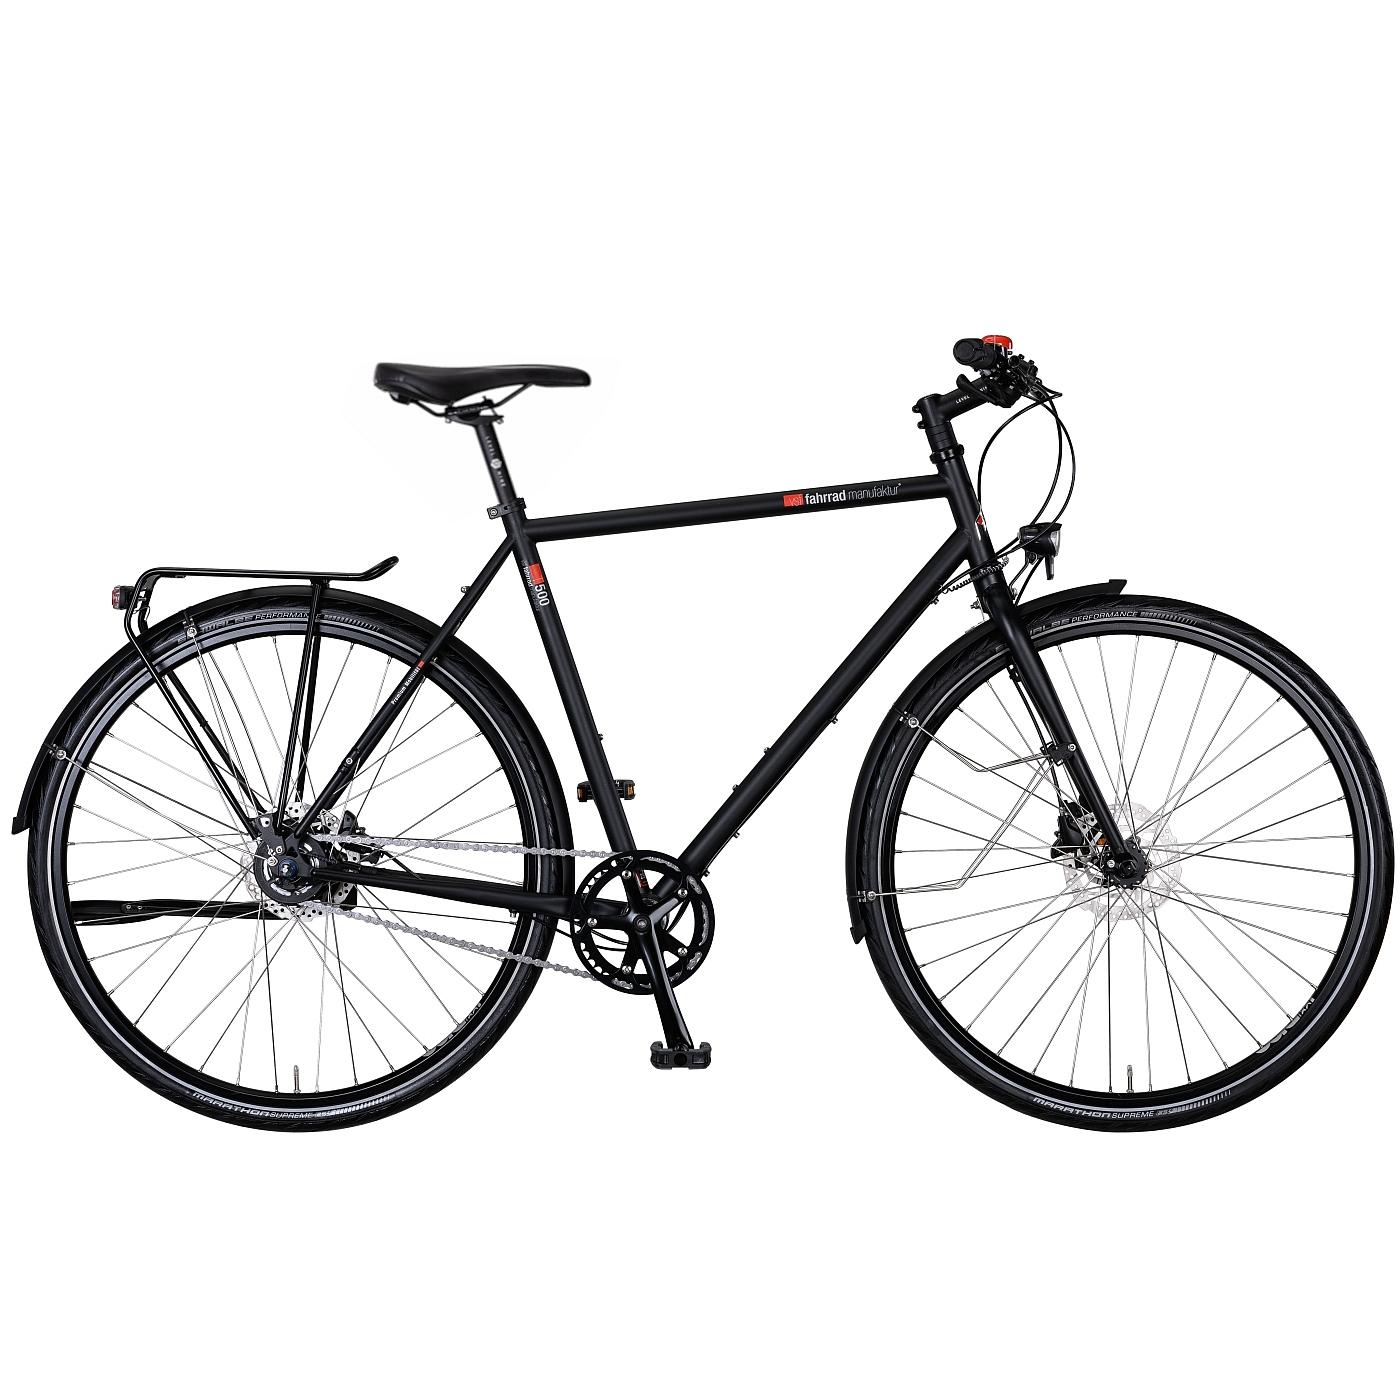 vsf fahrradmanufaktur T-500 Disc Alfine - Herren Trekkingrad - 2021 - ebony matt